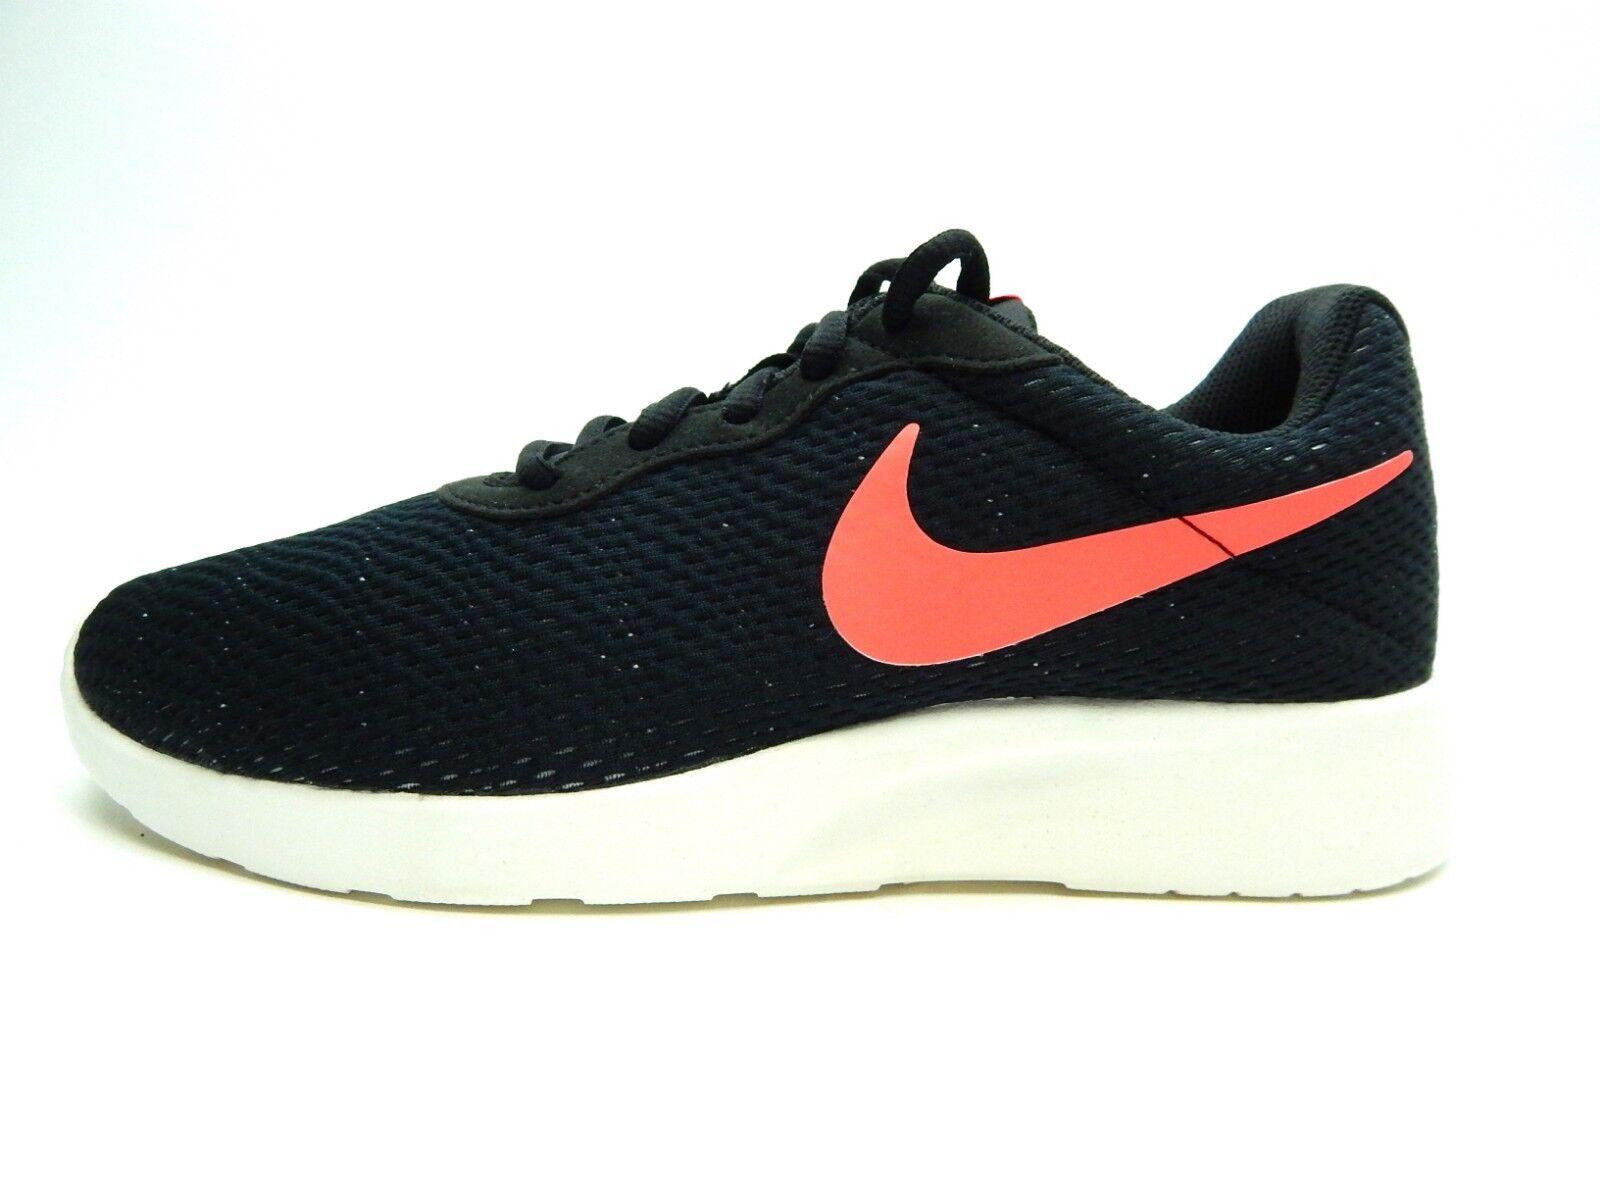 Nike Nike Nike tanjun se uomini scarpe taglia 6,5 nero rosso solare 3ba365